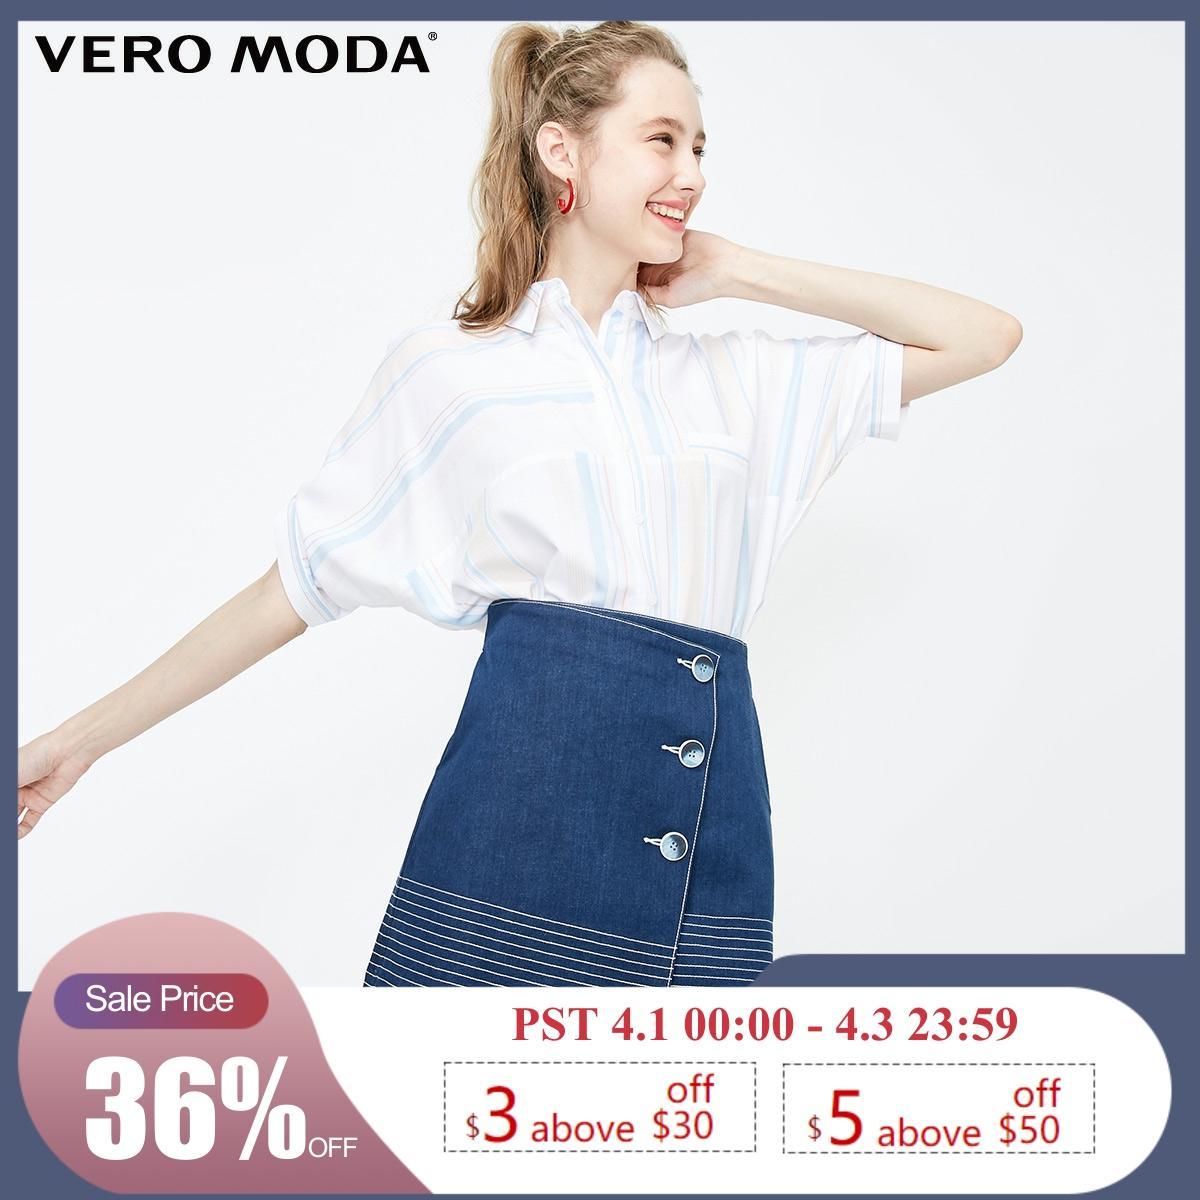 Vero Moda Women's Adjustable Sleeves Loose Fit Irregular Stripe Print Shirt   31926W525